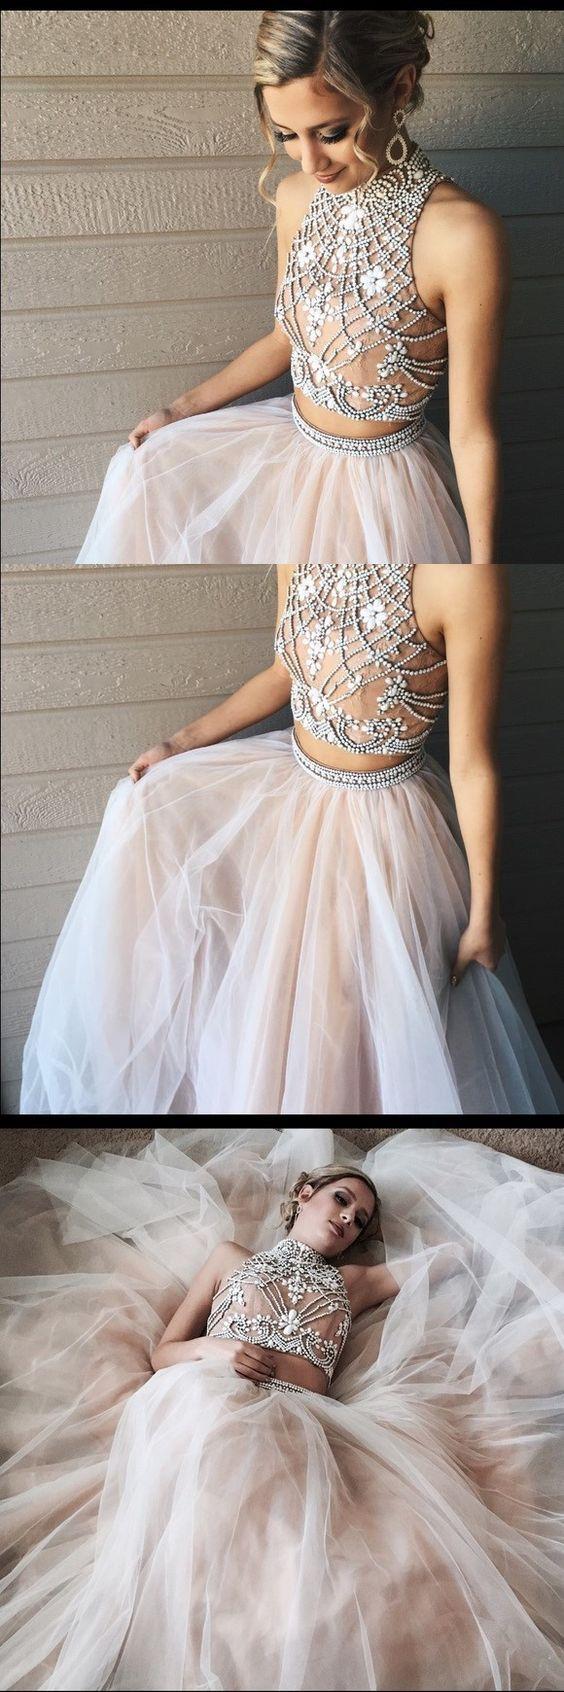 long prom dress high neck prom dress two piece prom dress